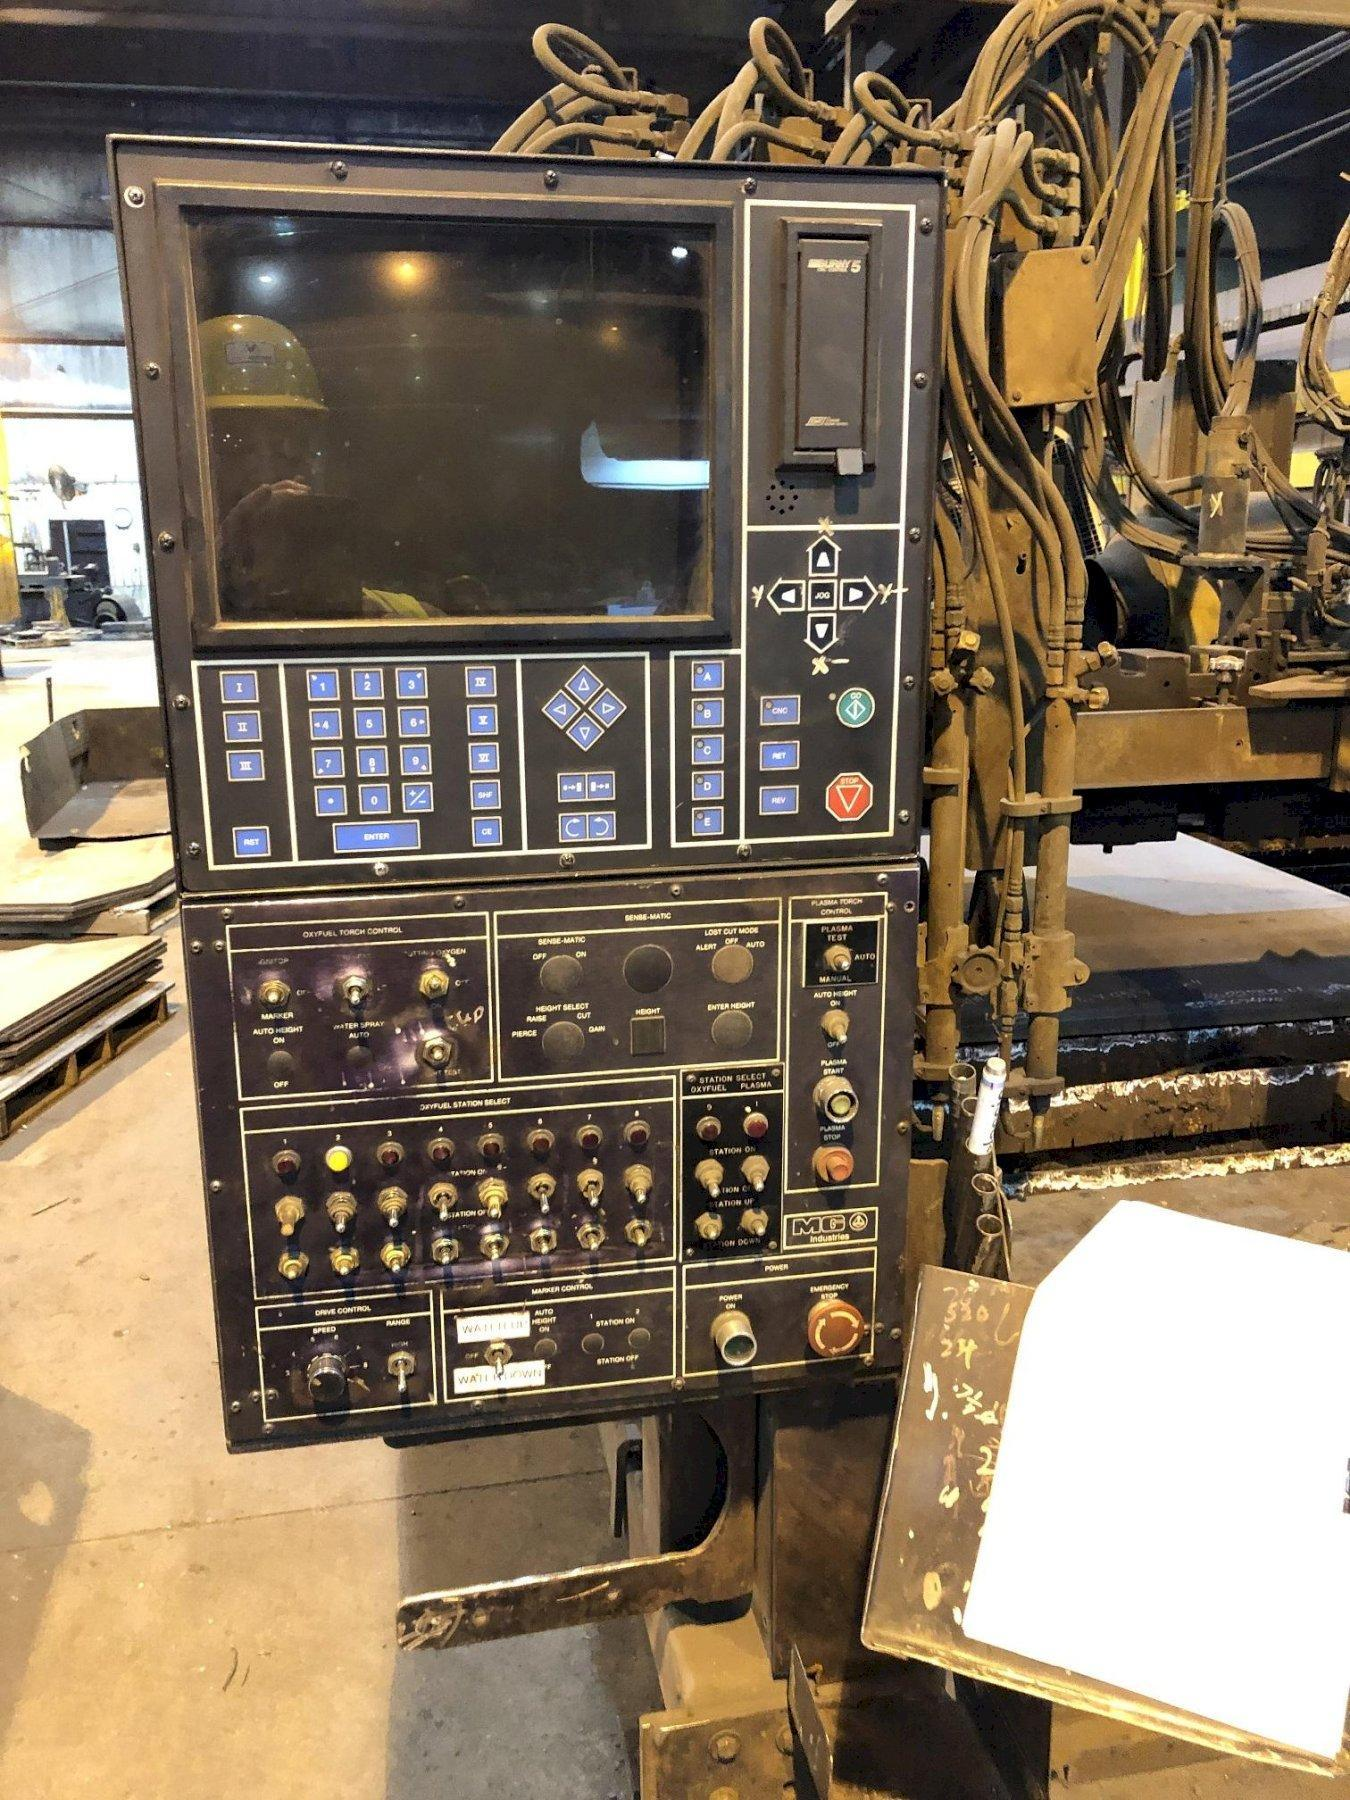 MG MODEL TMC-3500 CNC FLAME BURNER, NEW BURNY 5 AND SERVOS IN 2018